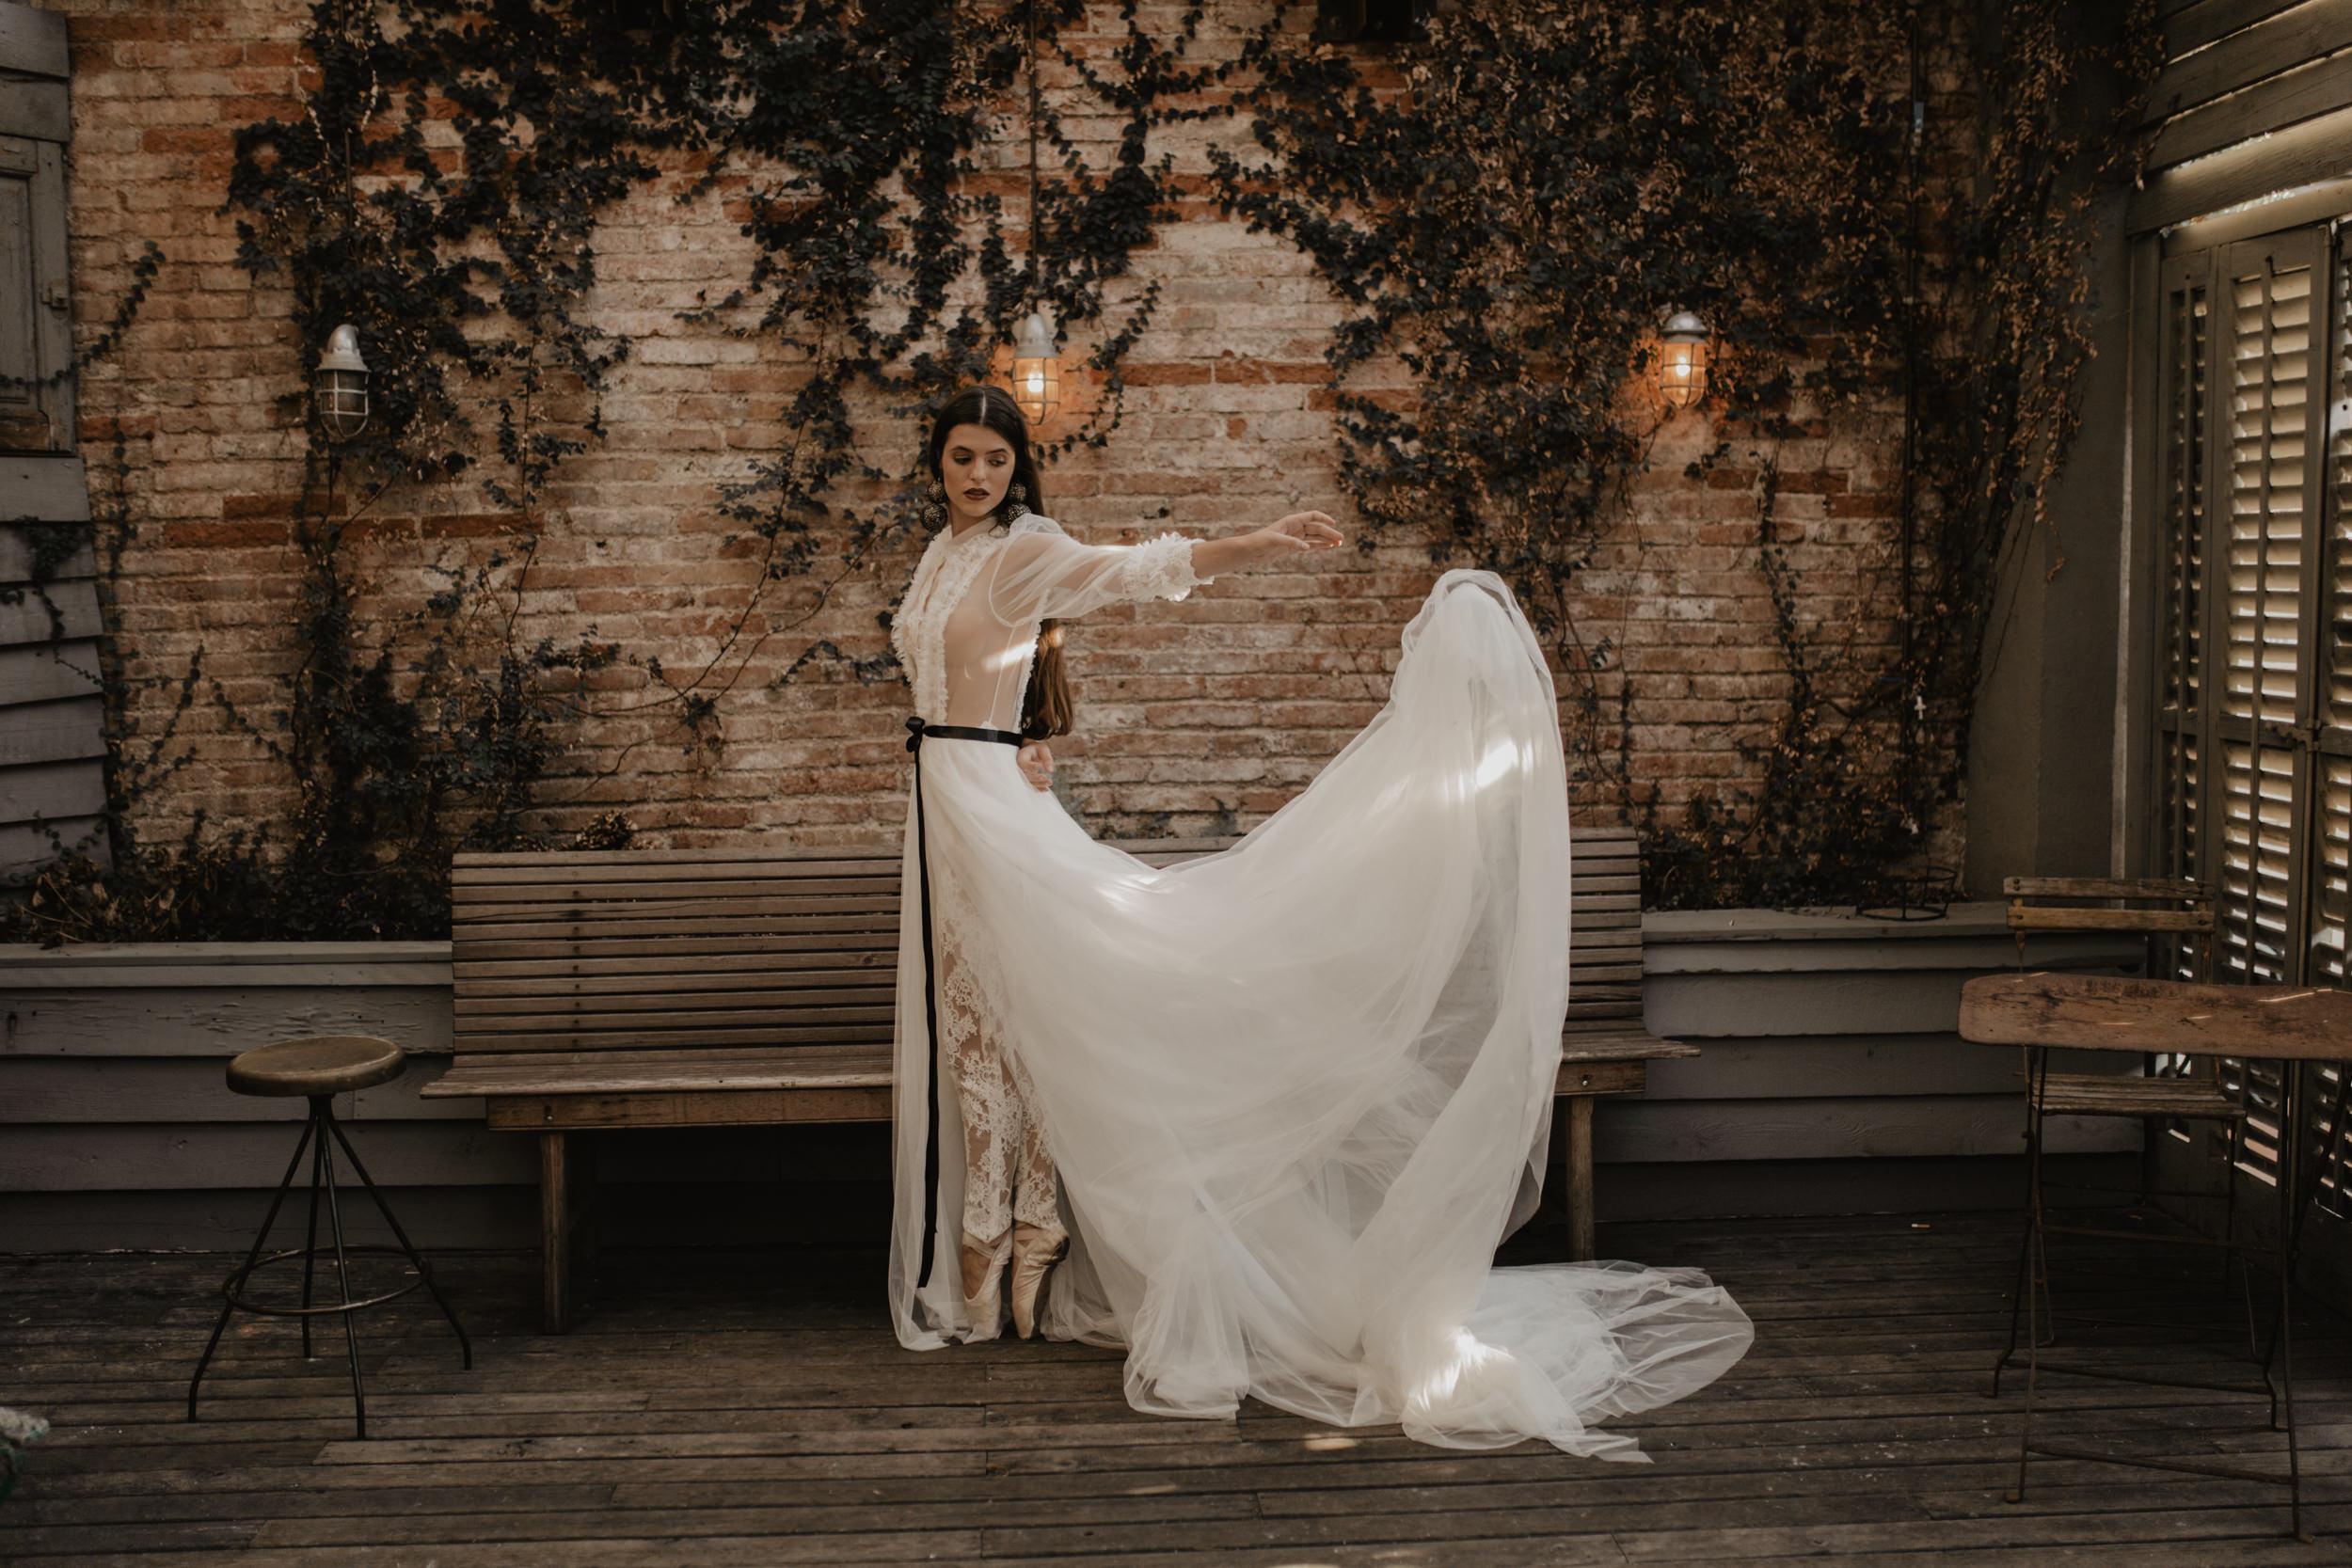 thenortherngirlphotography_photography_thenortherngirl_rebeccascabros_wedding_weddingphotography_weddingphotographer_barcelona_fashionbarcelona_unconventionalwedding_lacasademuñecas-154.jpg